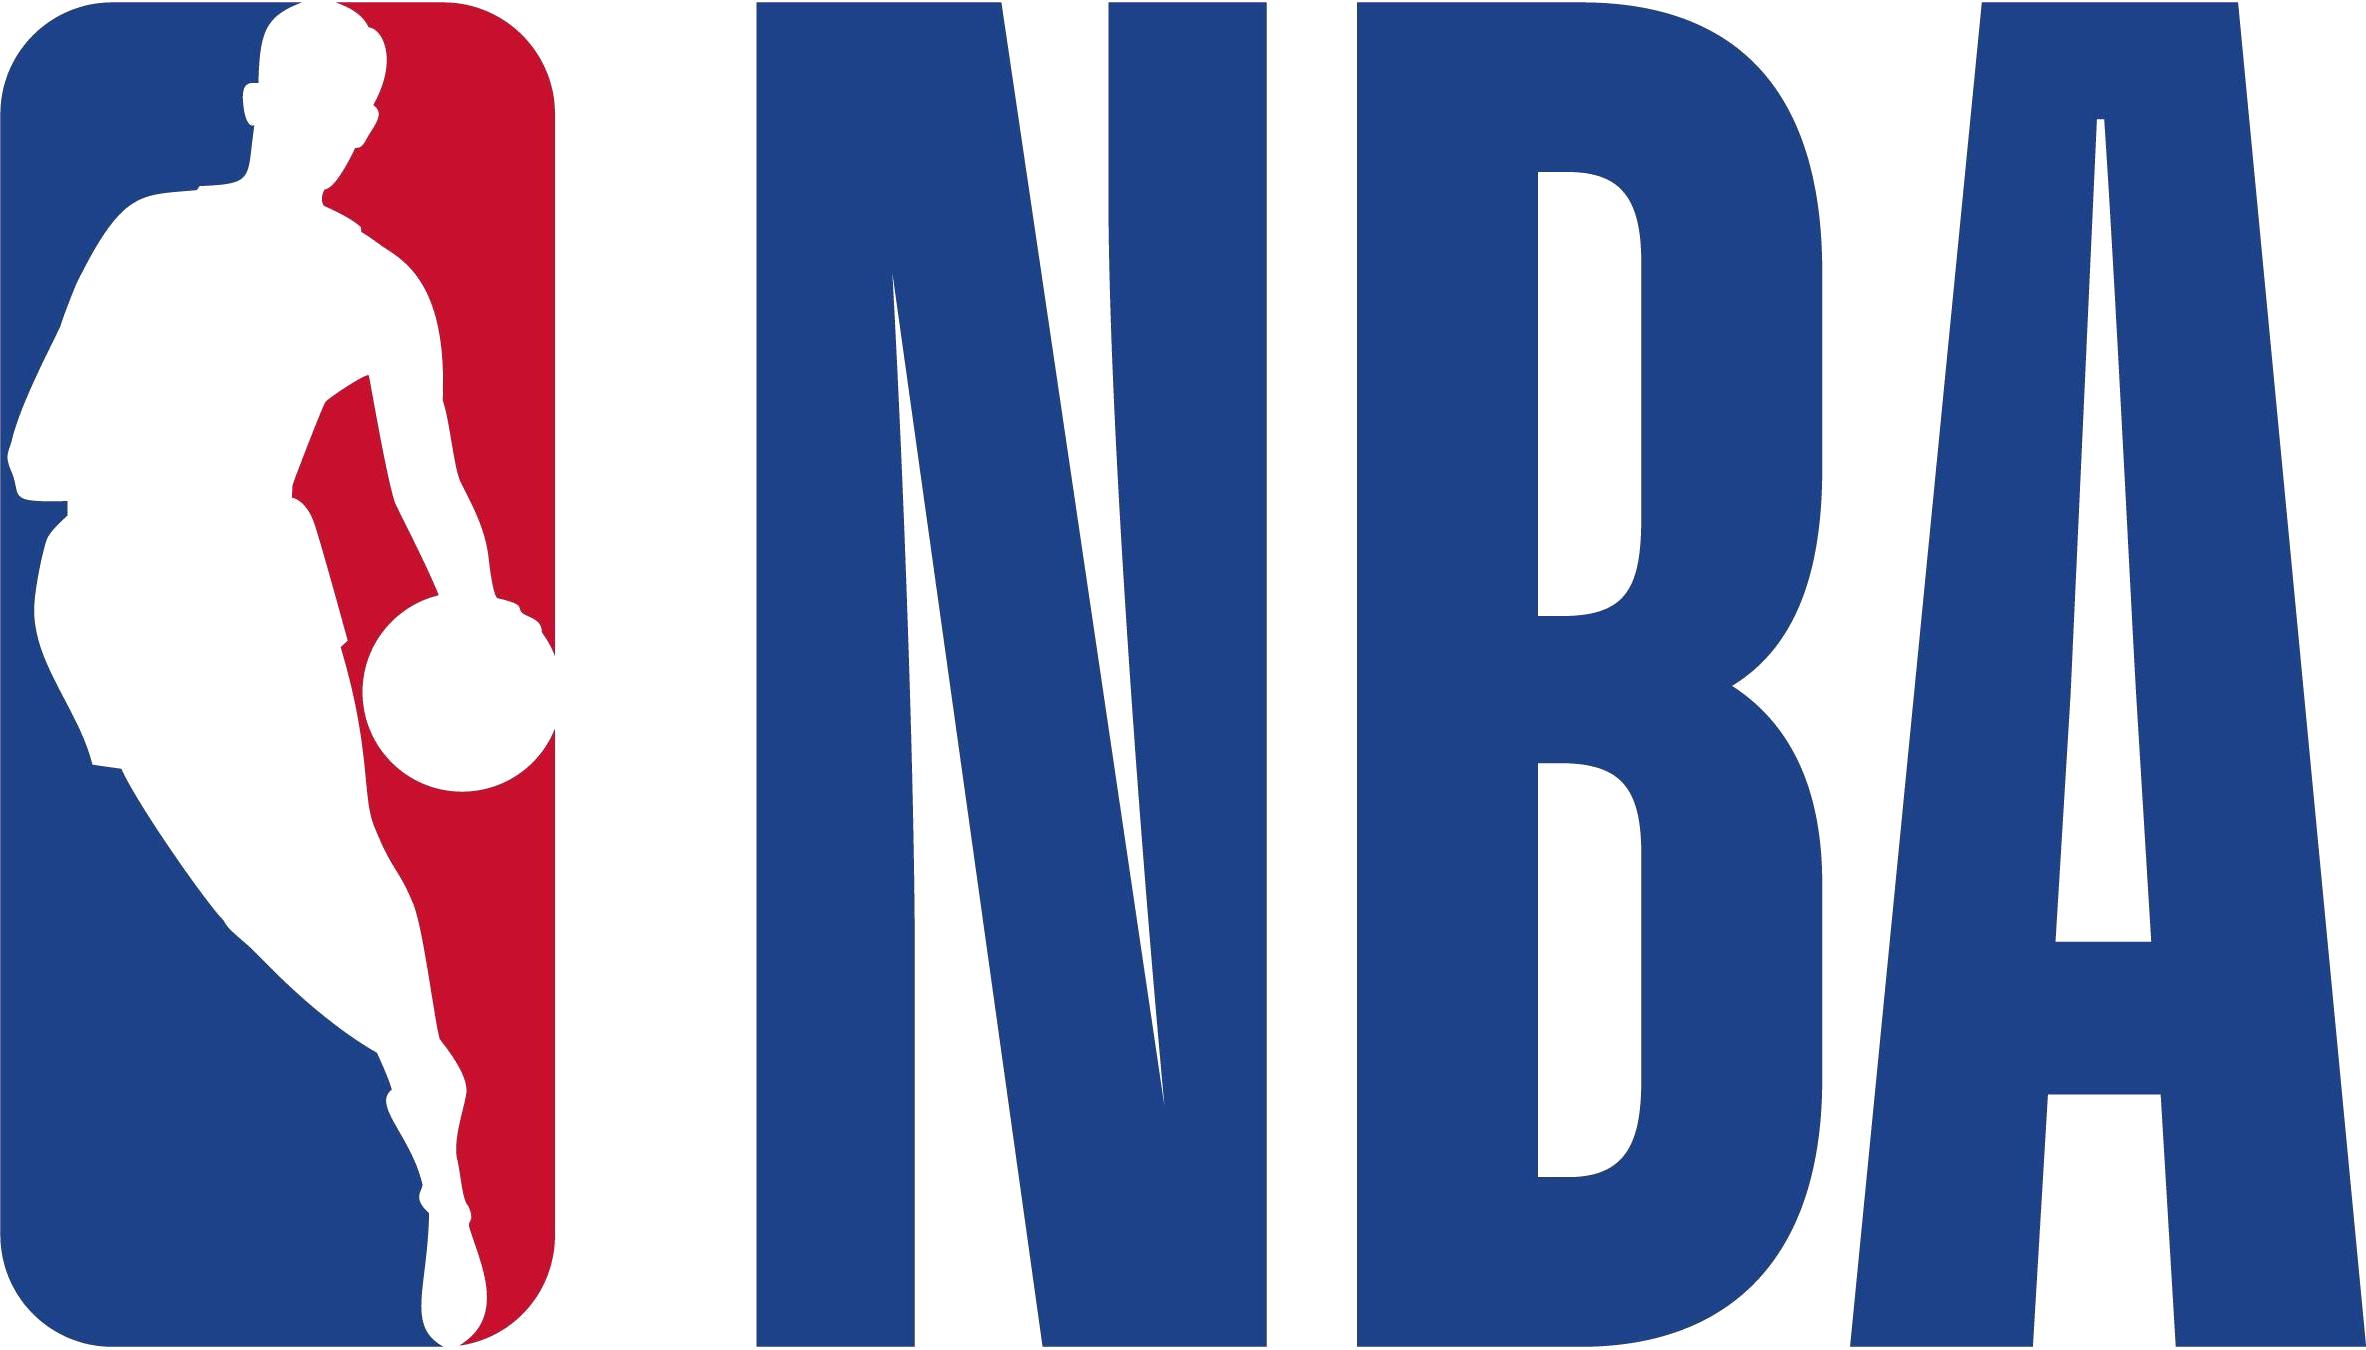 NBA IPTV | NBA LEAGUE PASS IPTV STREAMING SERVICE